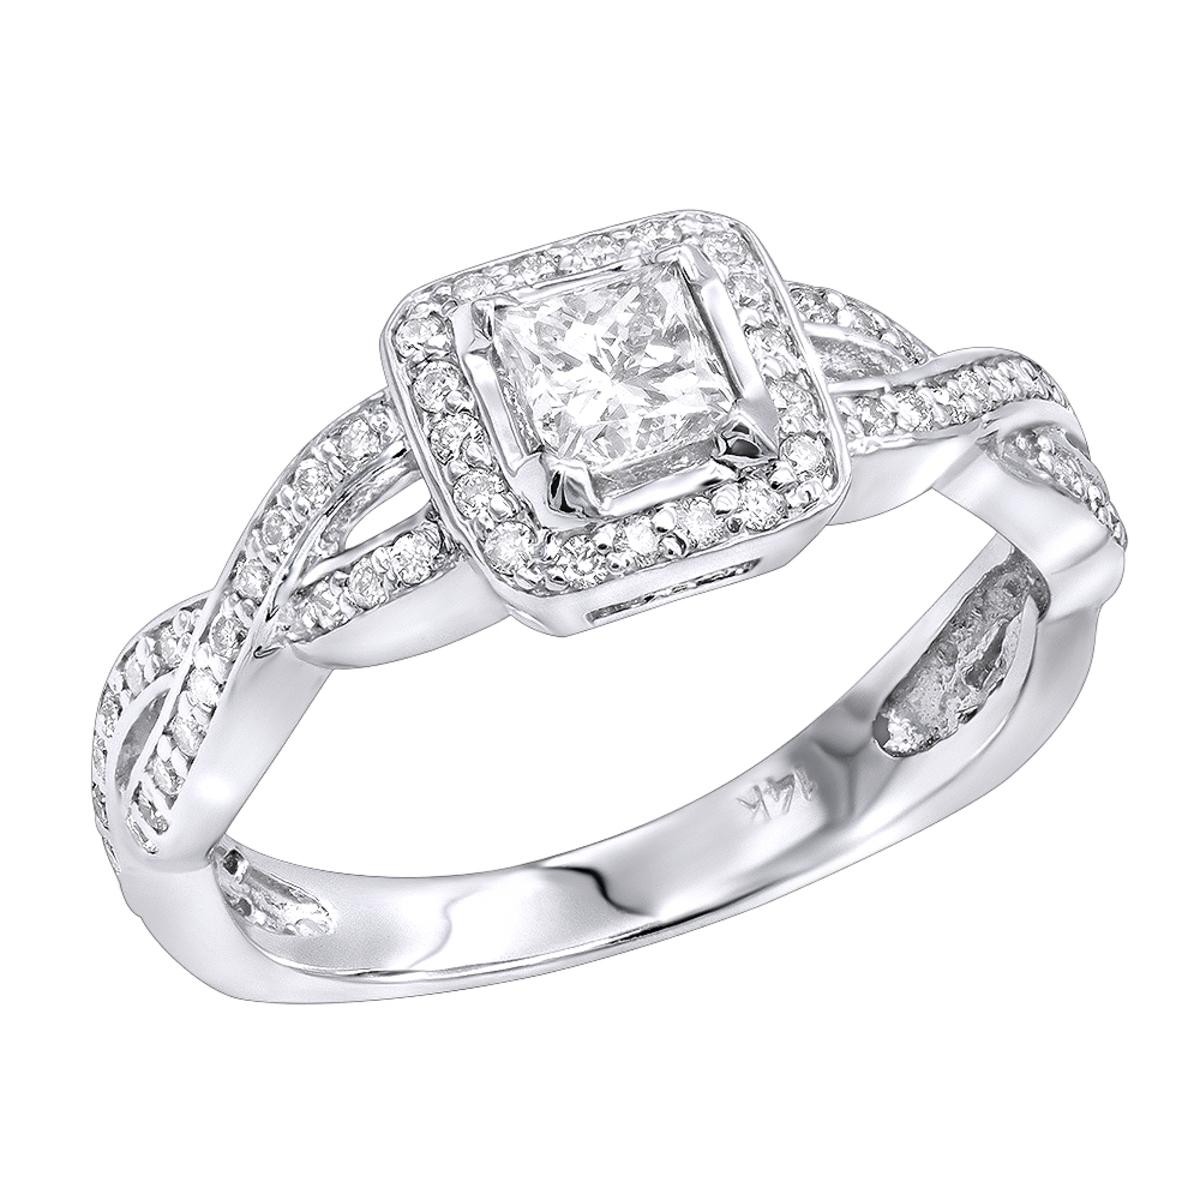 14K Gold Diamond Unique Engagement Ring 0.75ct